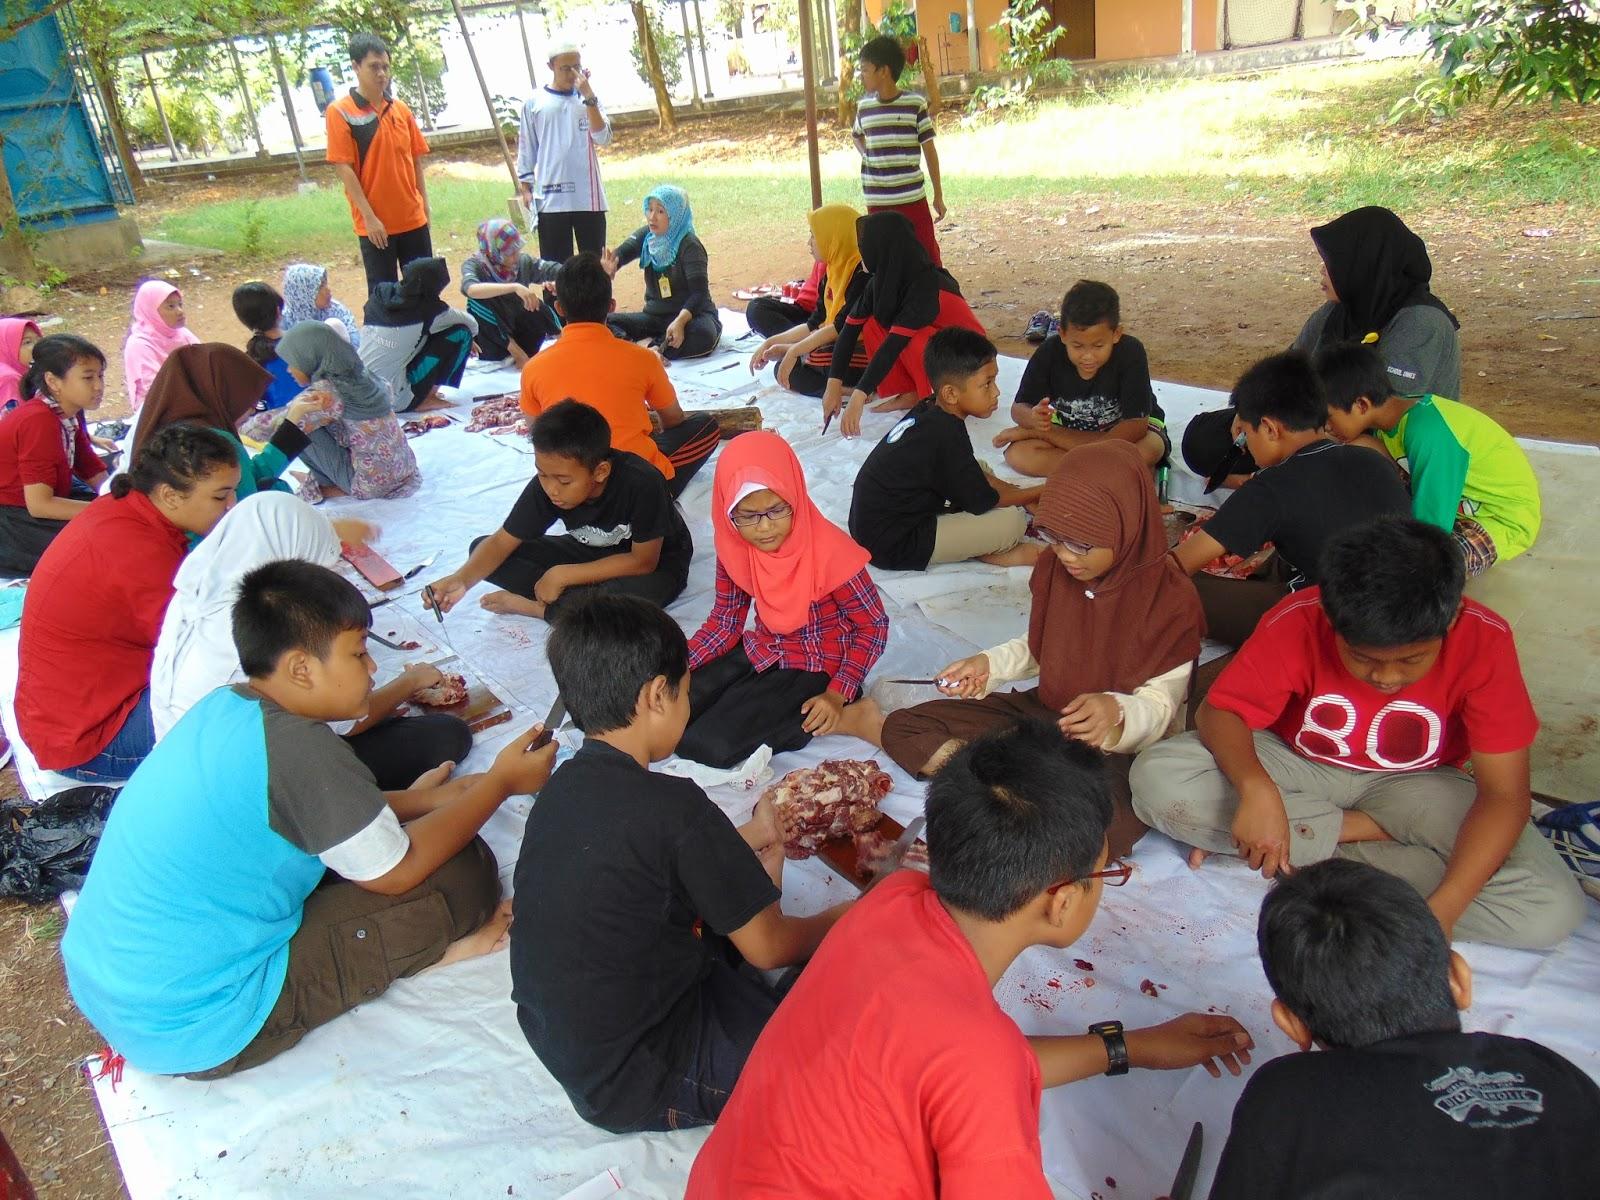 Latihan Qurban Di Labschool Unnes Semarang 1437 H Rifan Fajrin